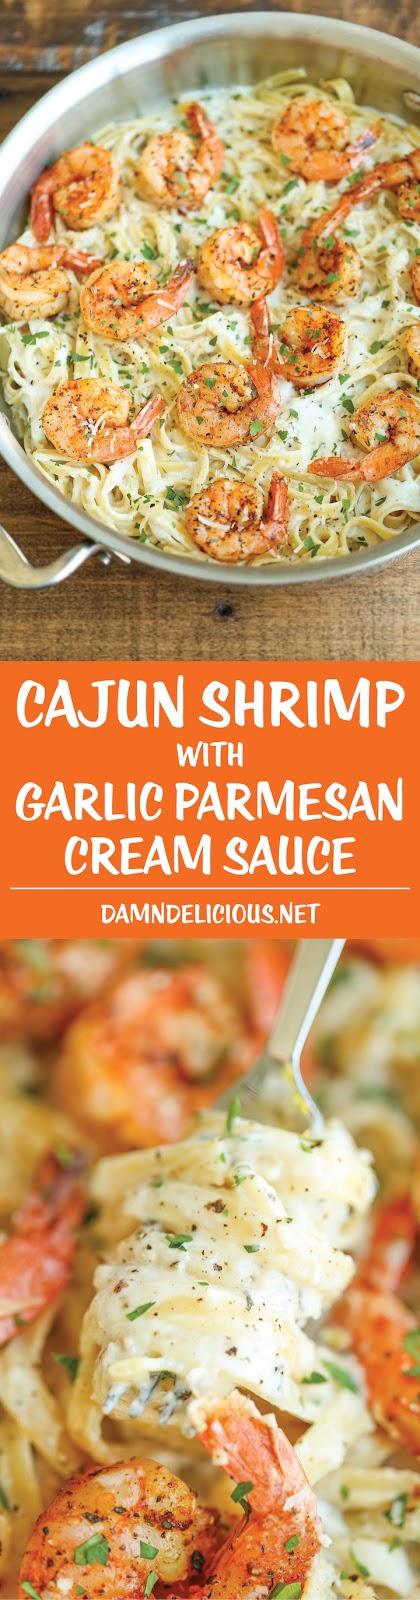 BEST CAJUN SHRIMP WITH GARLIC PARMESAN CREAM SAUCE RECIPE